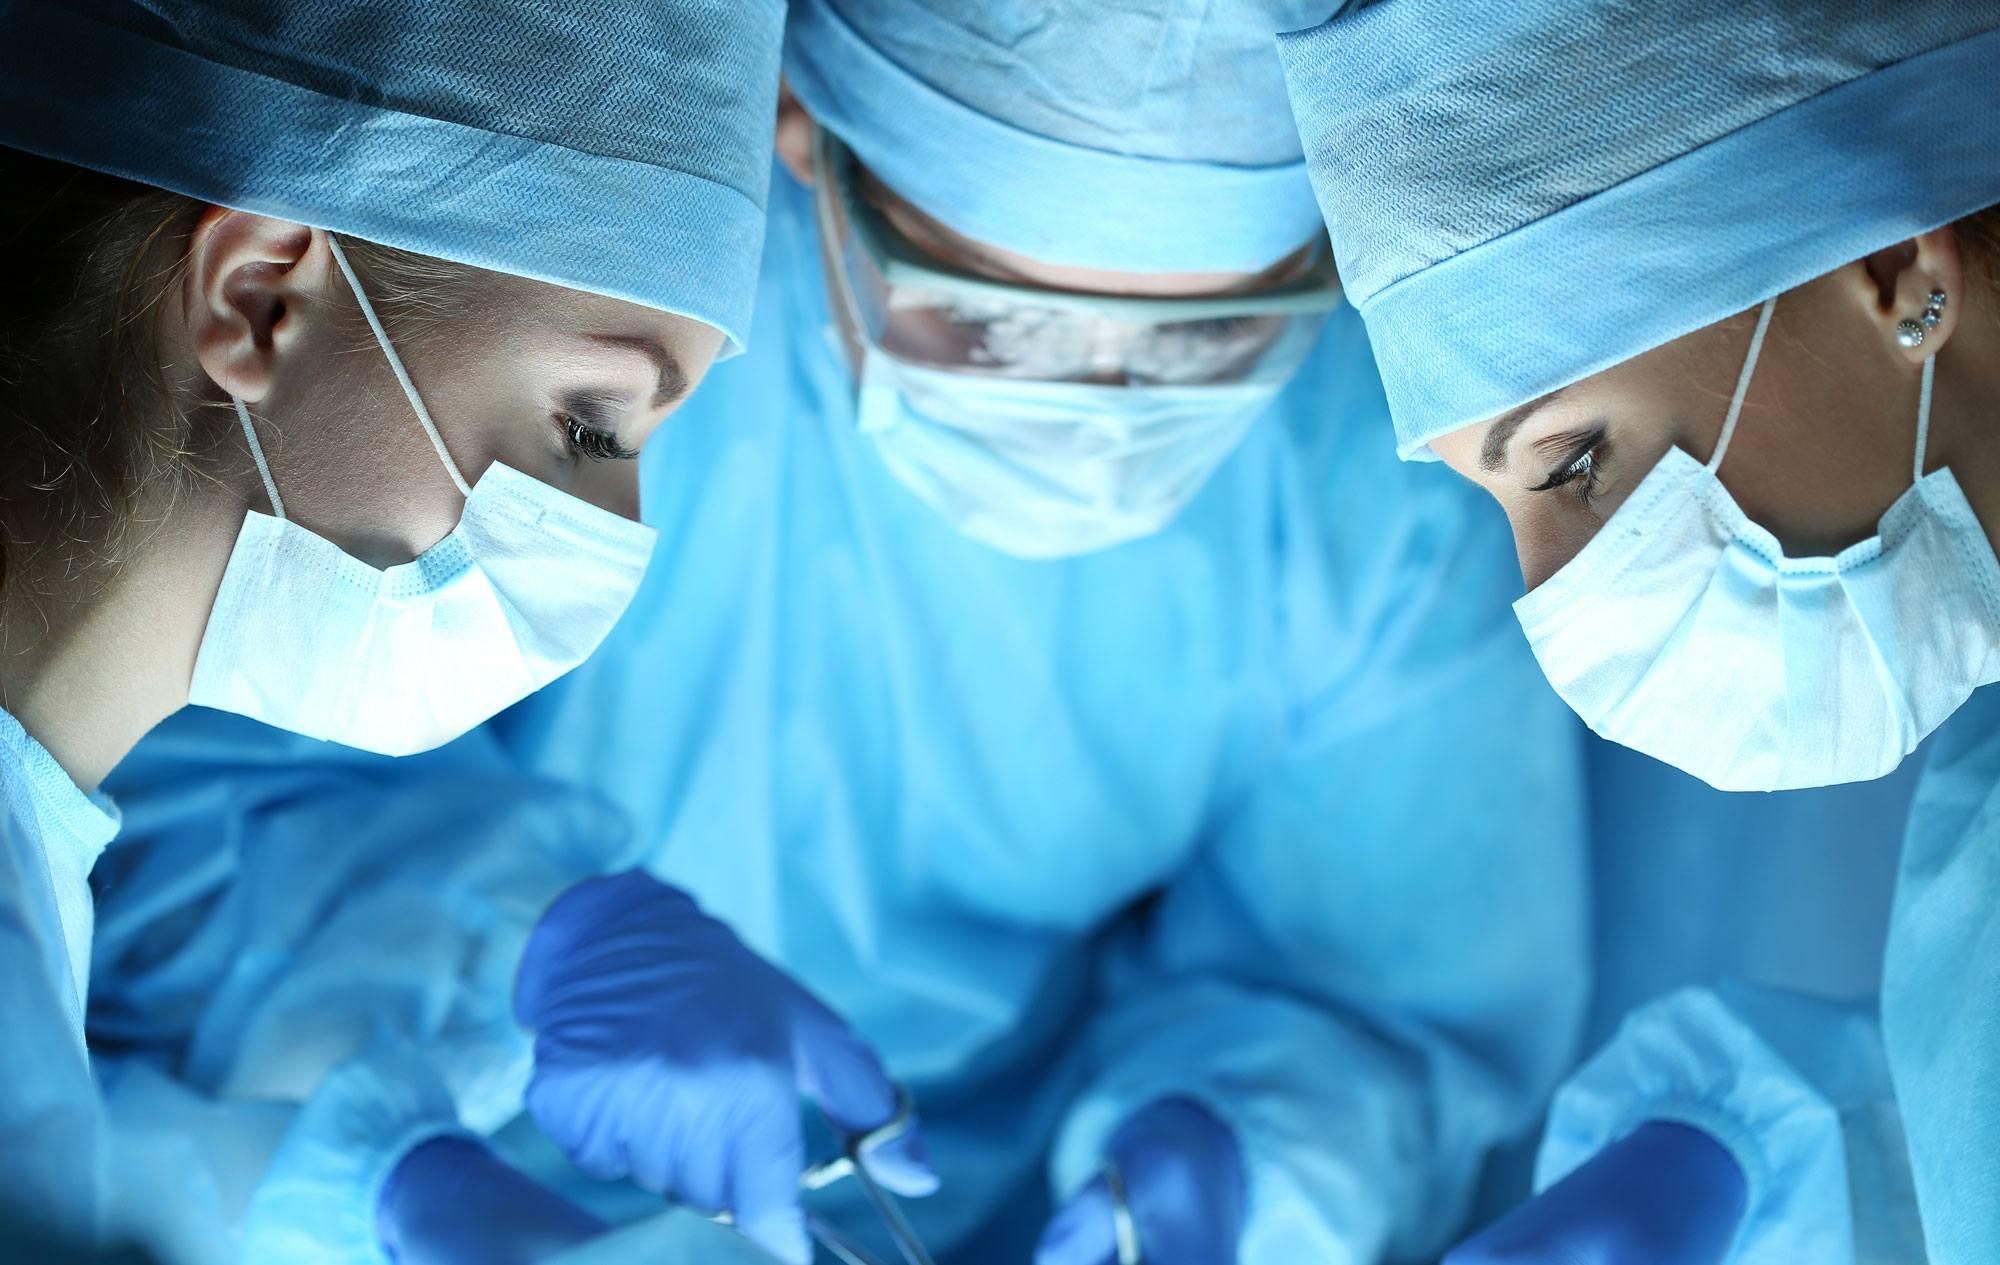 biaya operasi ambeien